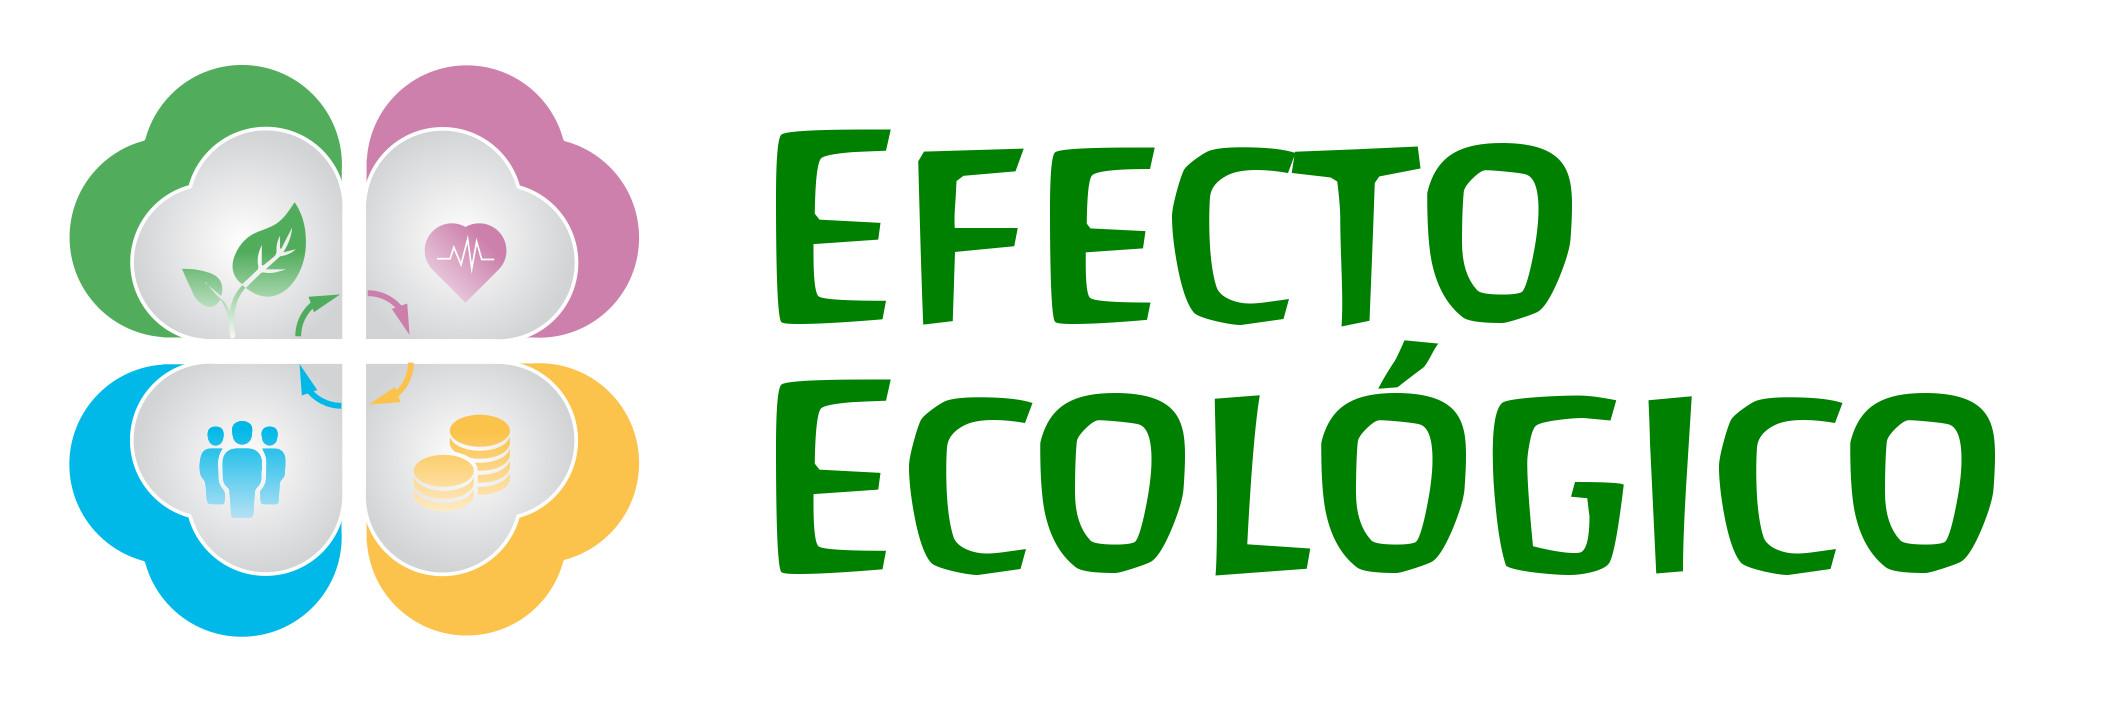 Efecto Ecológico